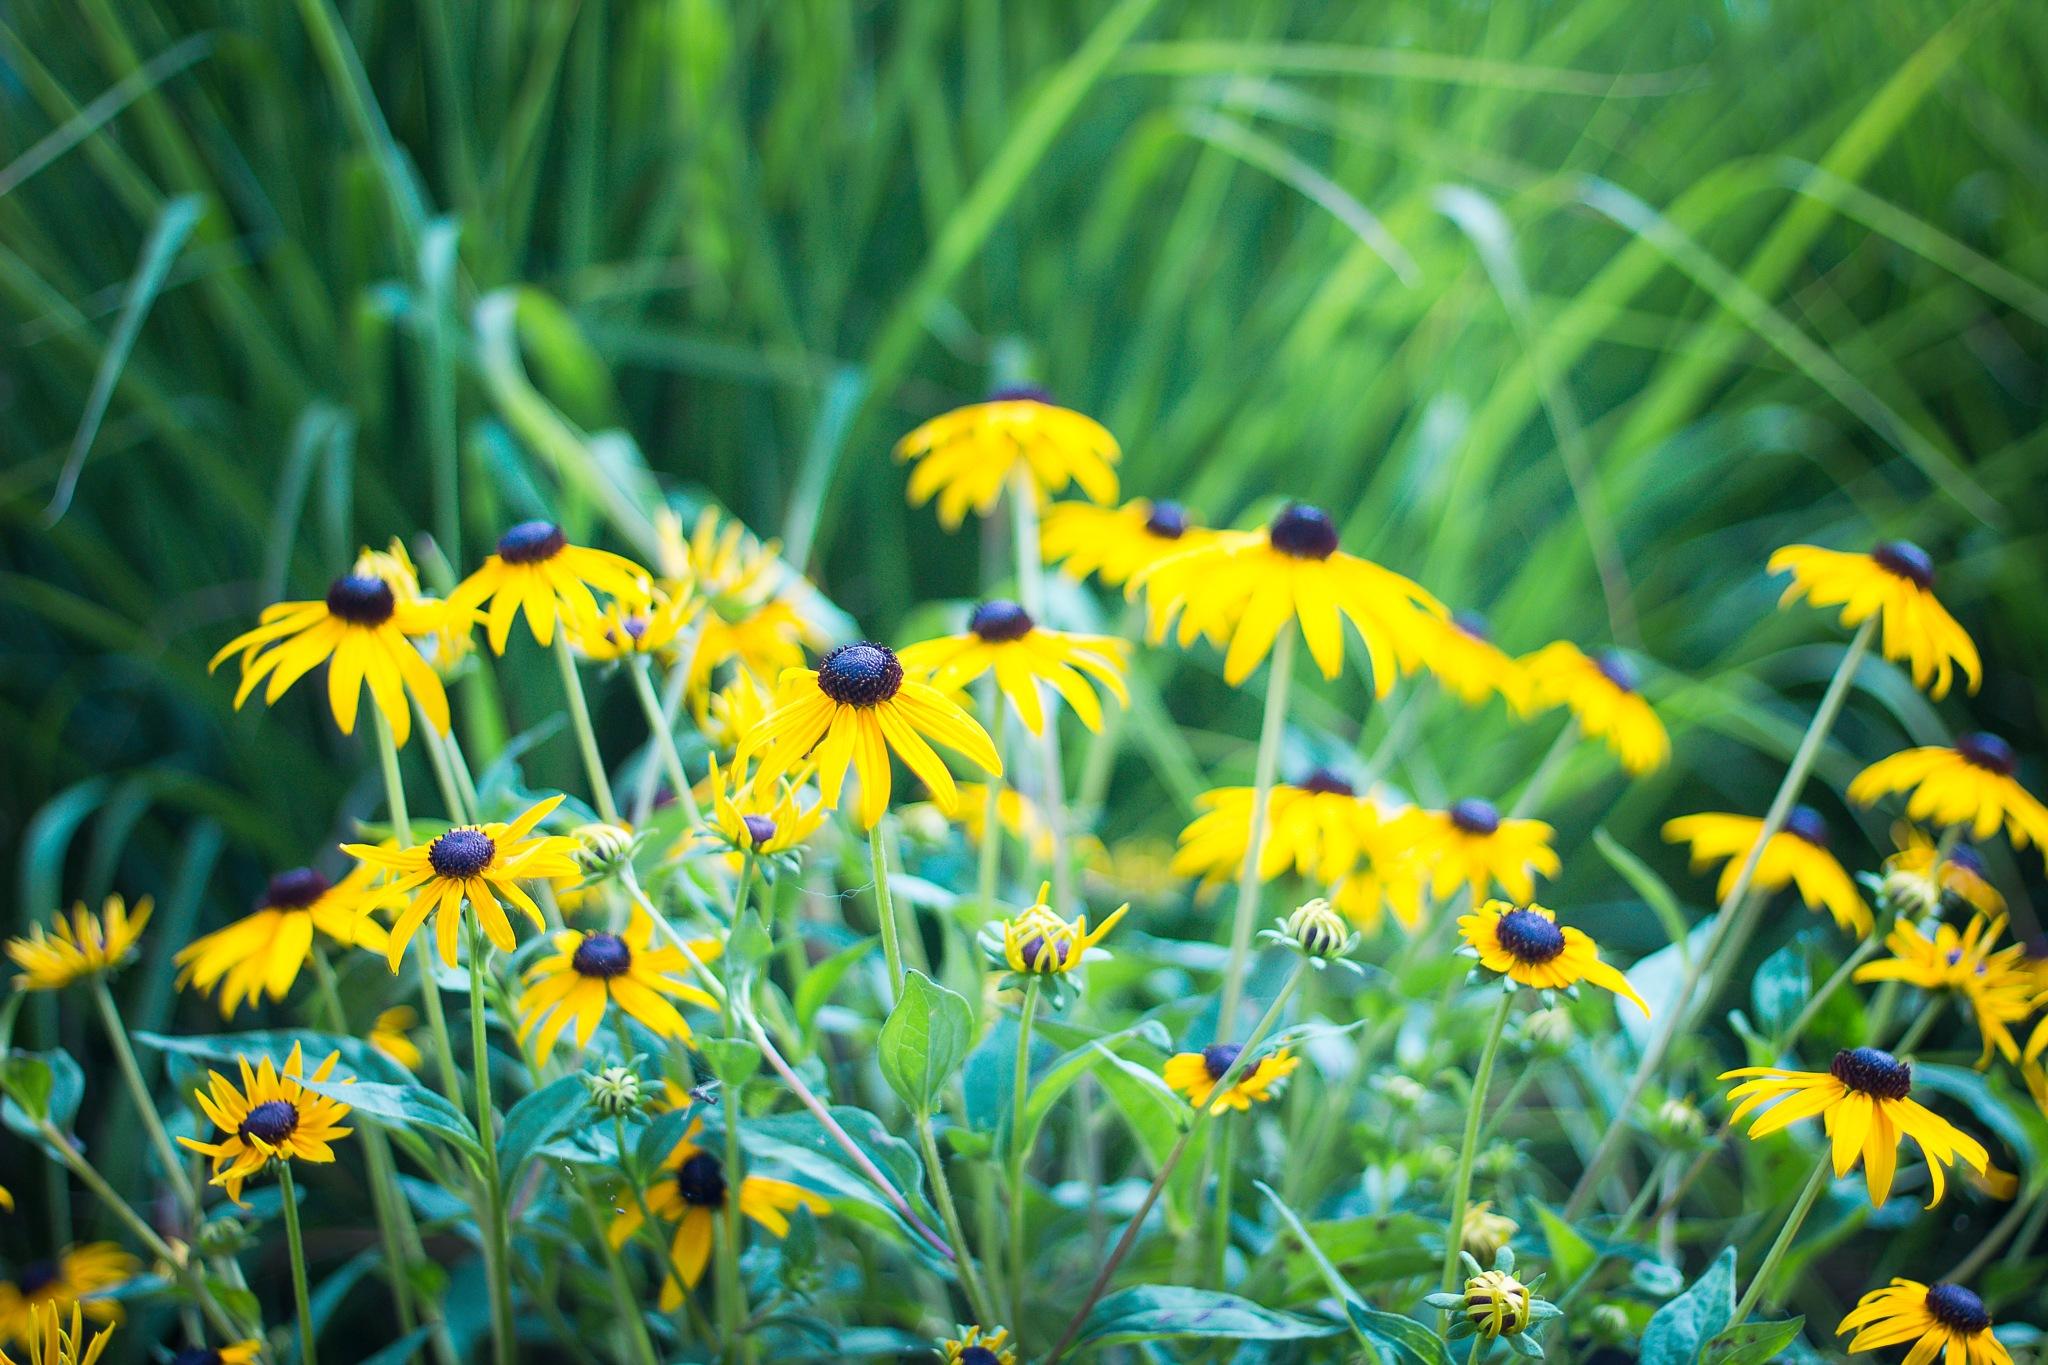 Bright summer flowers by Monique DeLay Gartner